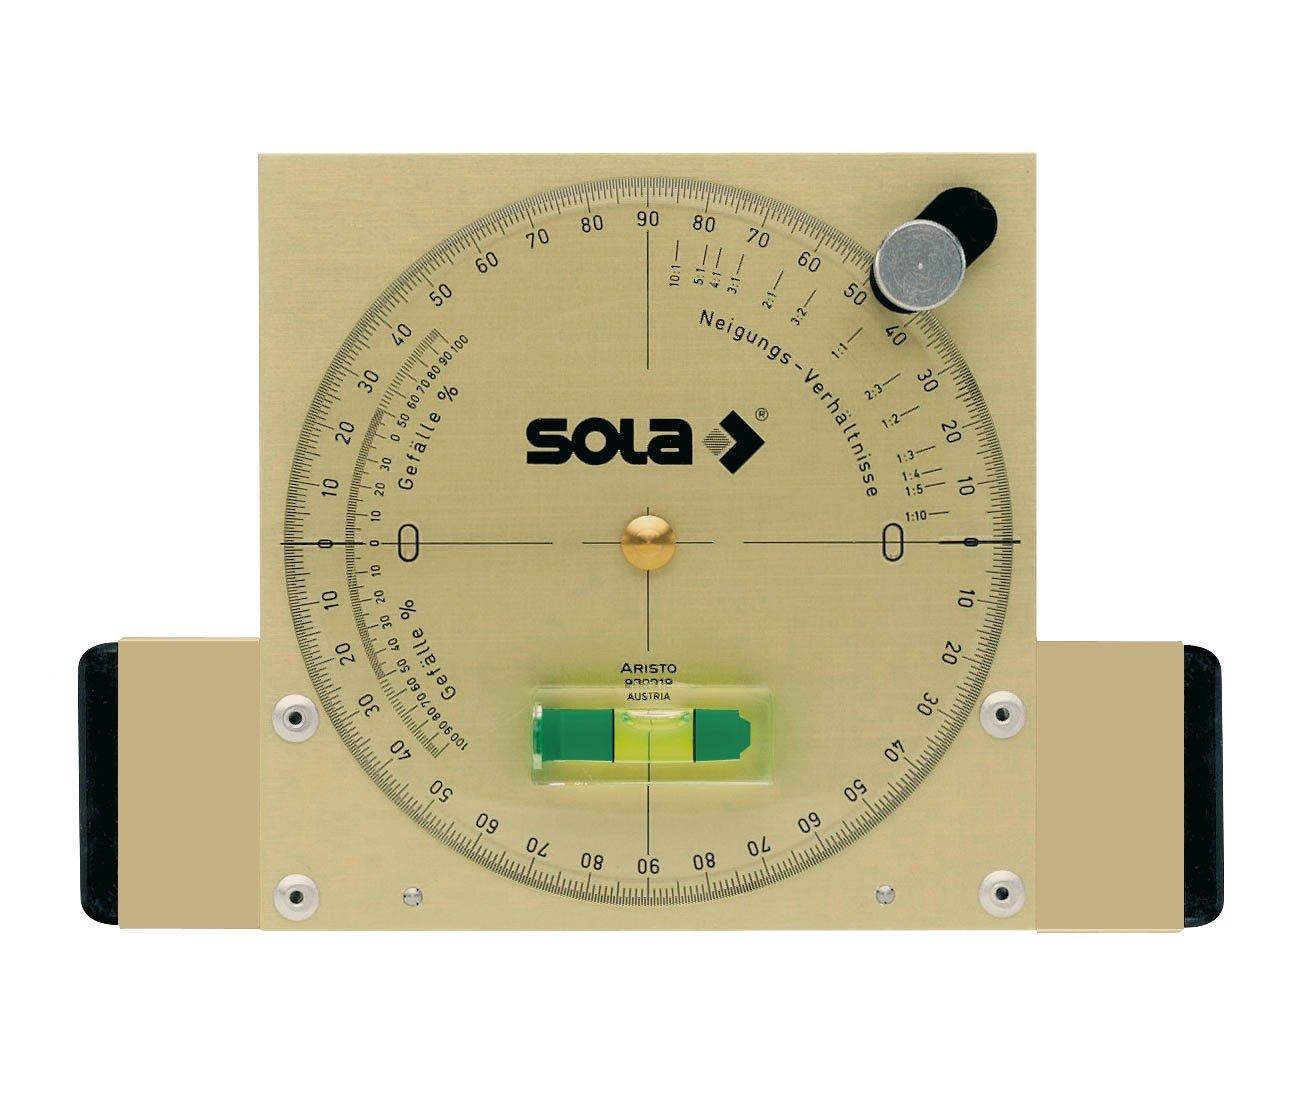 Sola NAM Nivel medidor de /ángulos magn/ético de aluminio extra resistente de 15 cm con burbuja de precisi/ón Focus